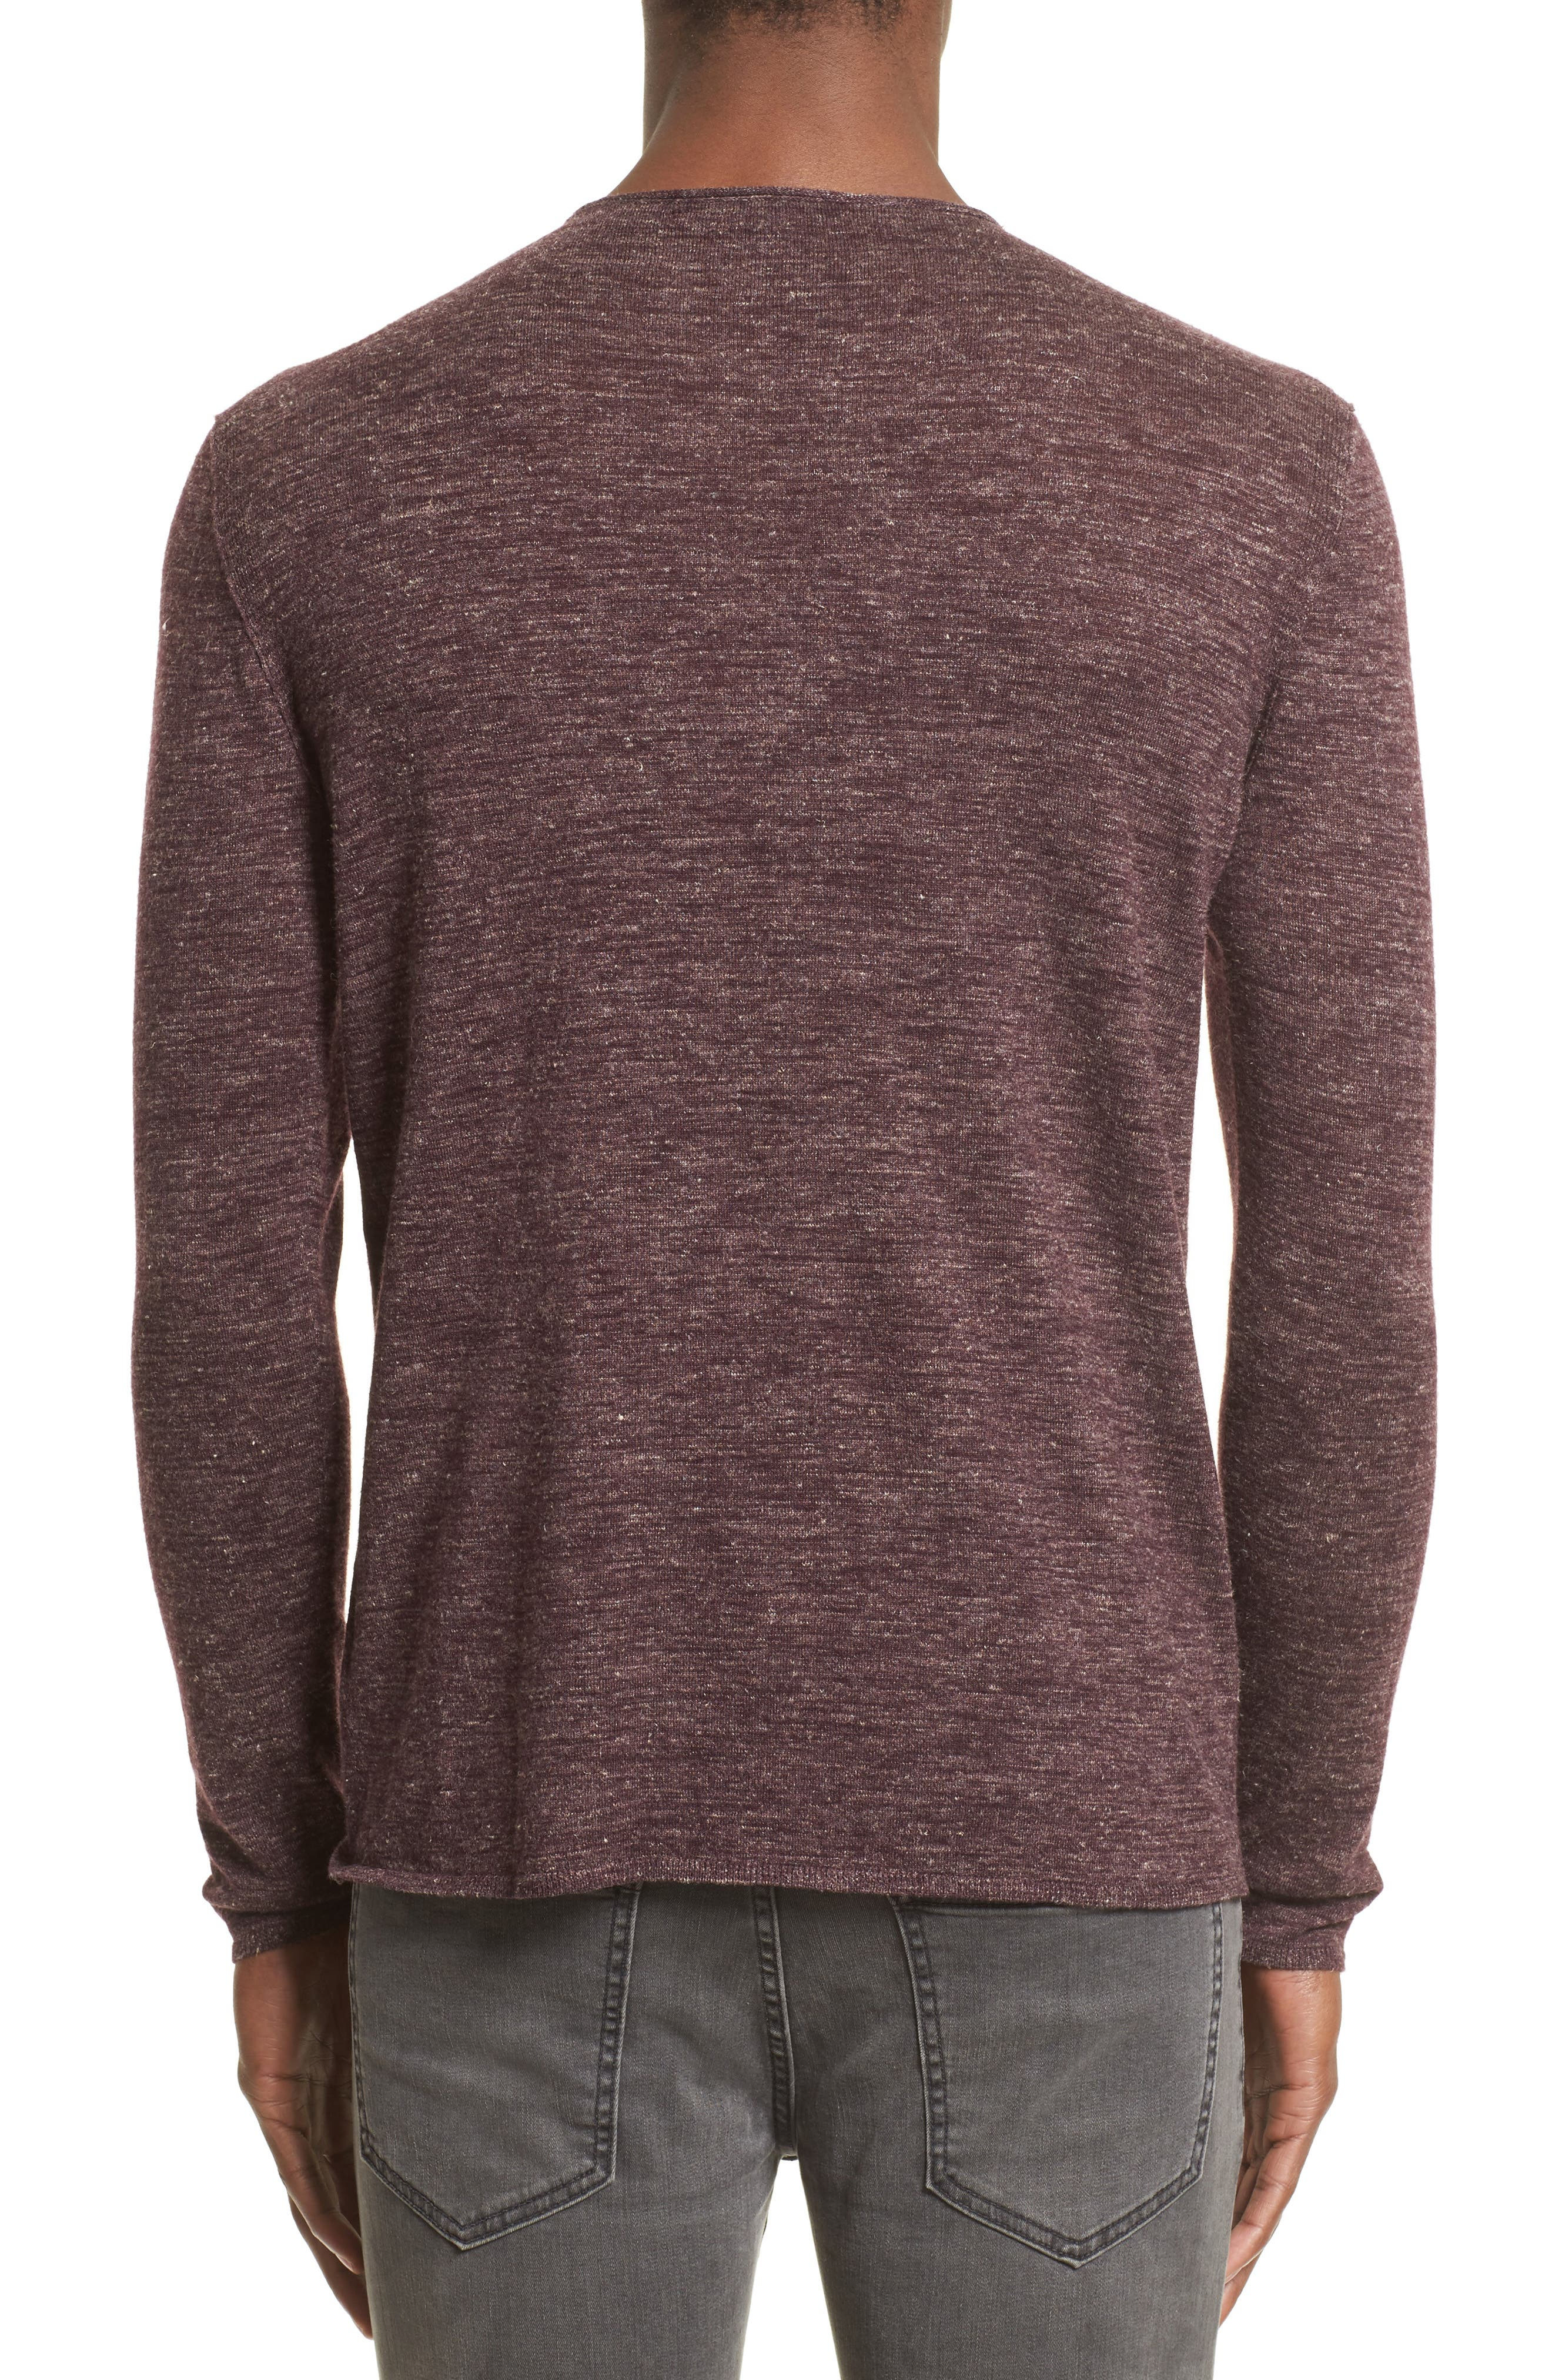 Heathered Crewneck Sweater,                             Alternate thumbnail 2, color,                             Oxblood